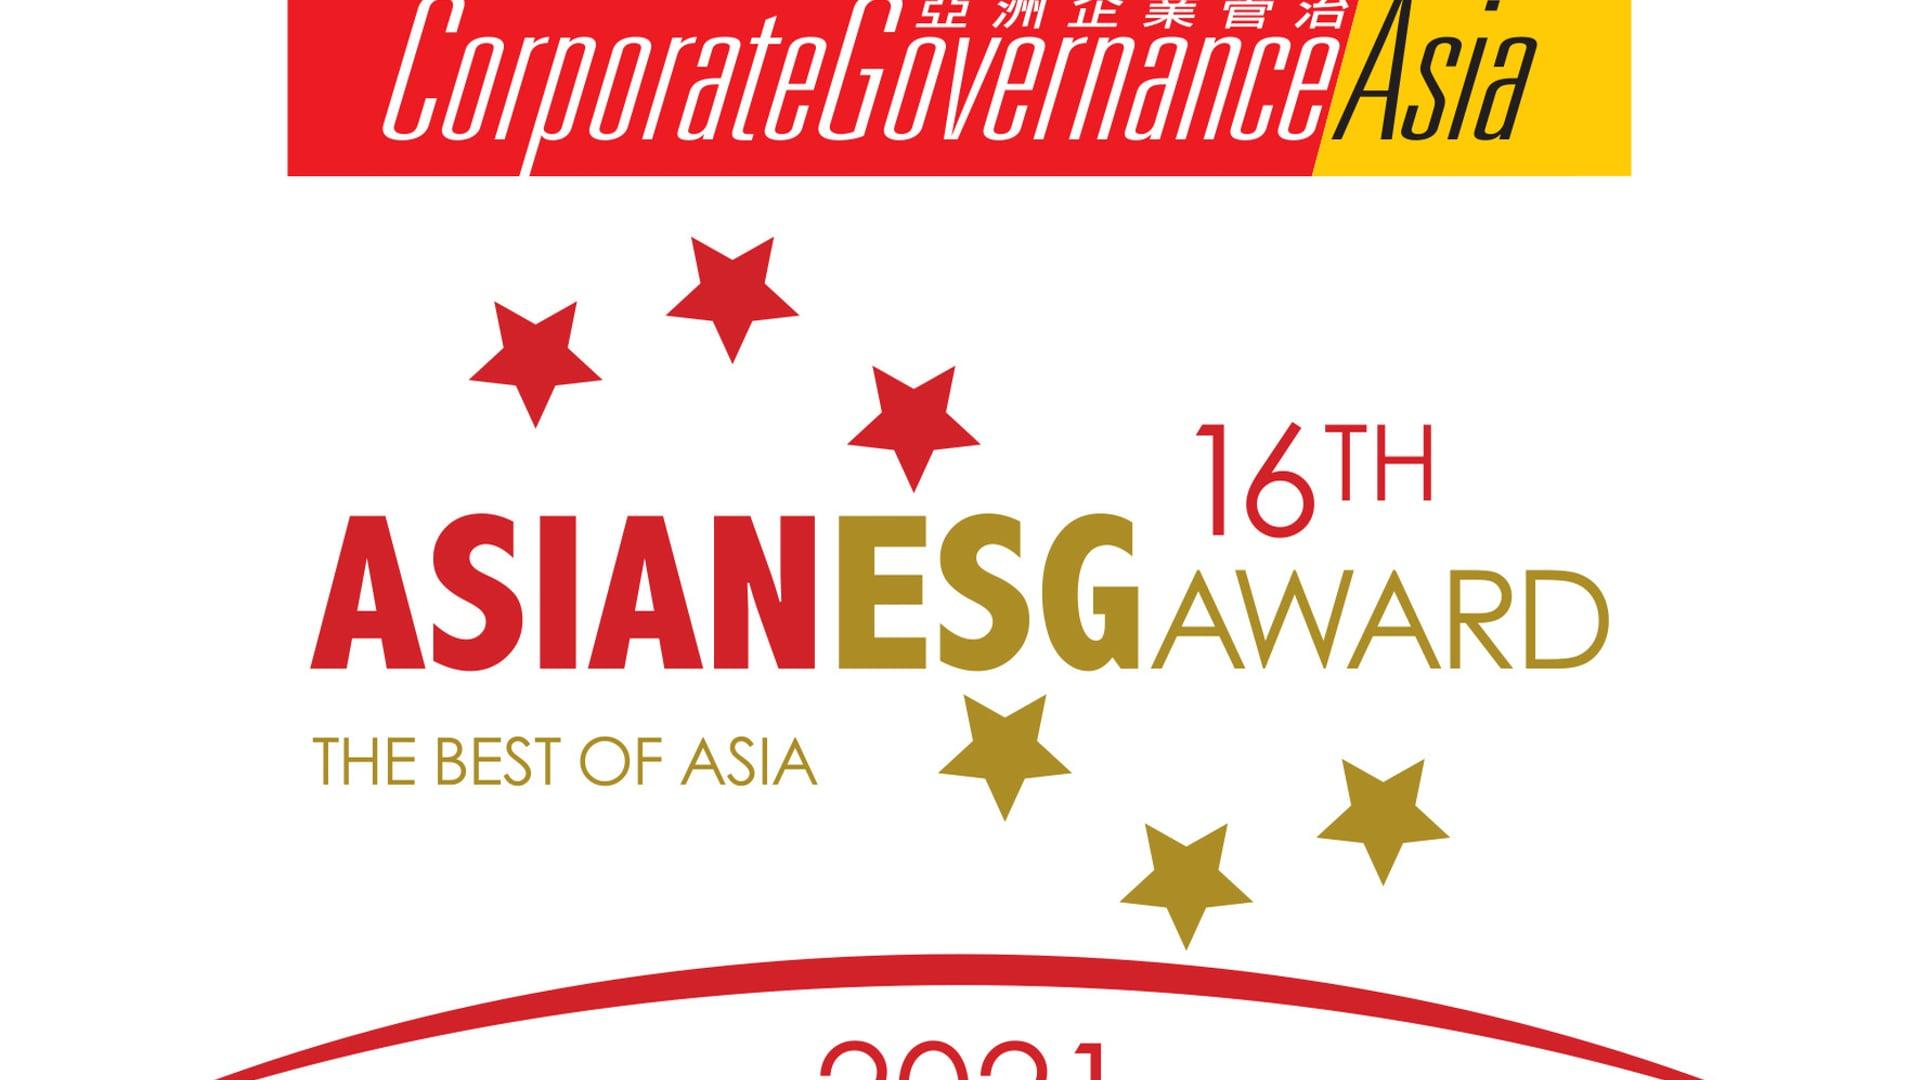 Awardees Asian ESG Award 2021